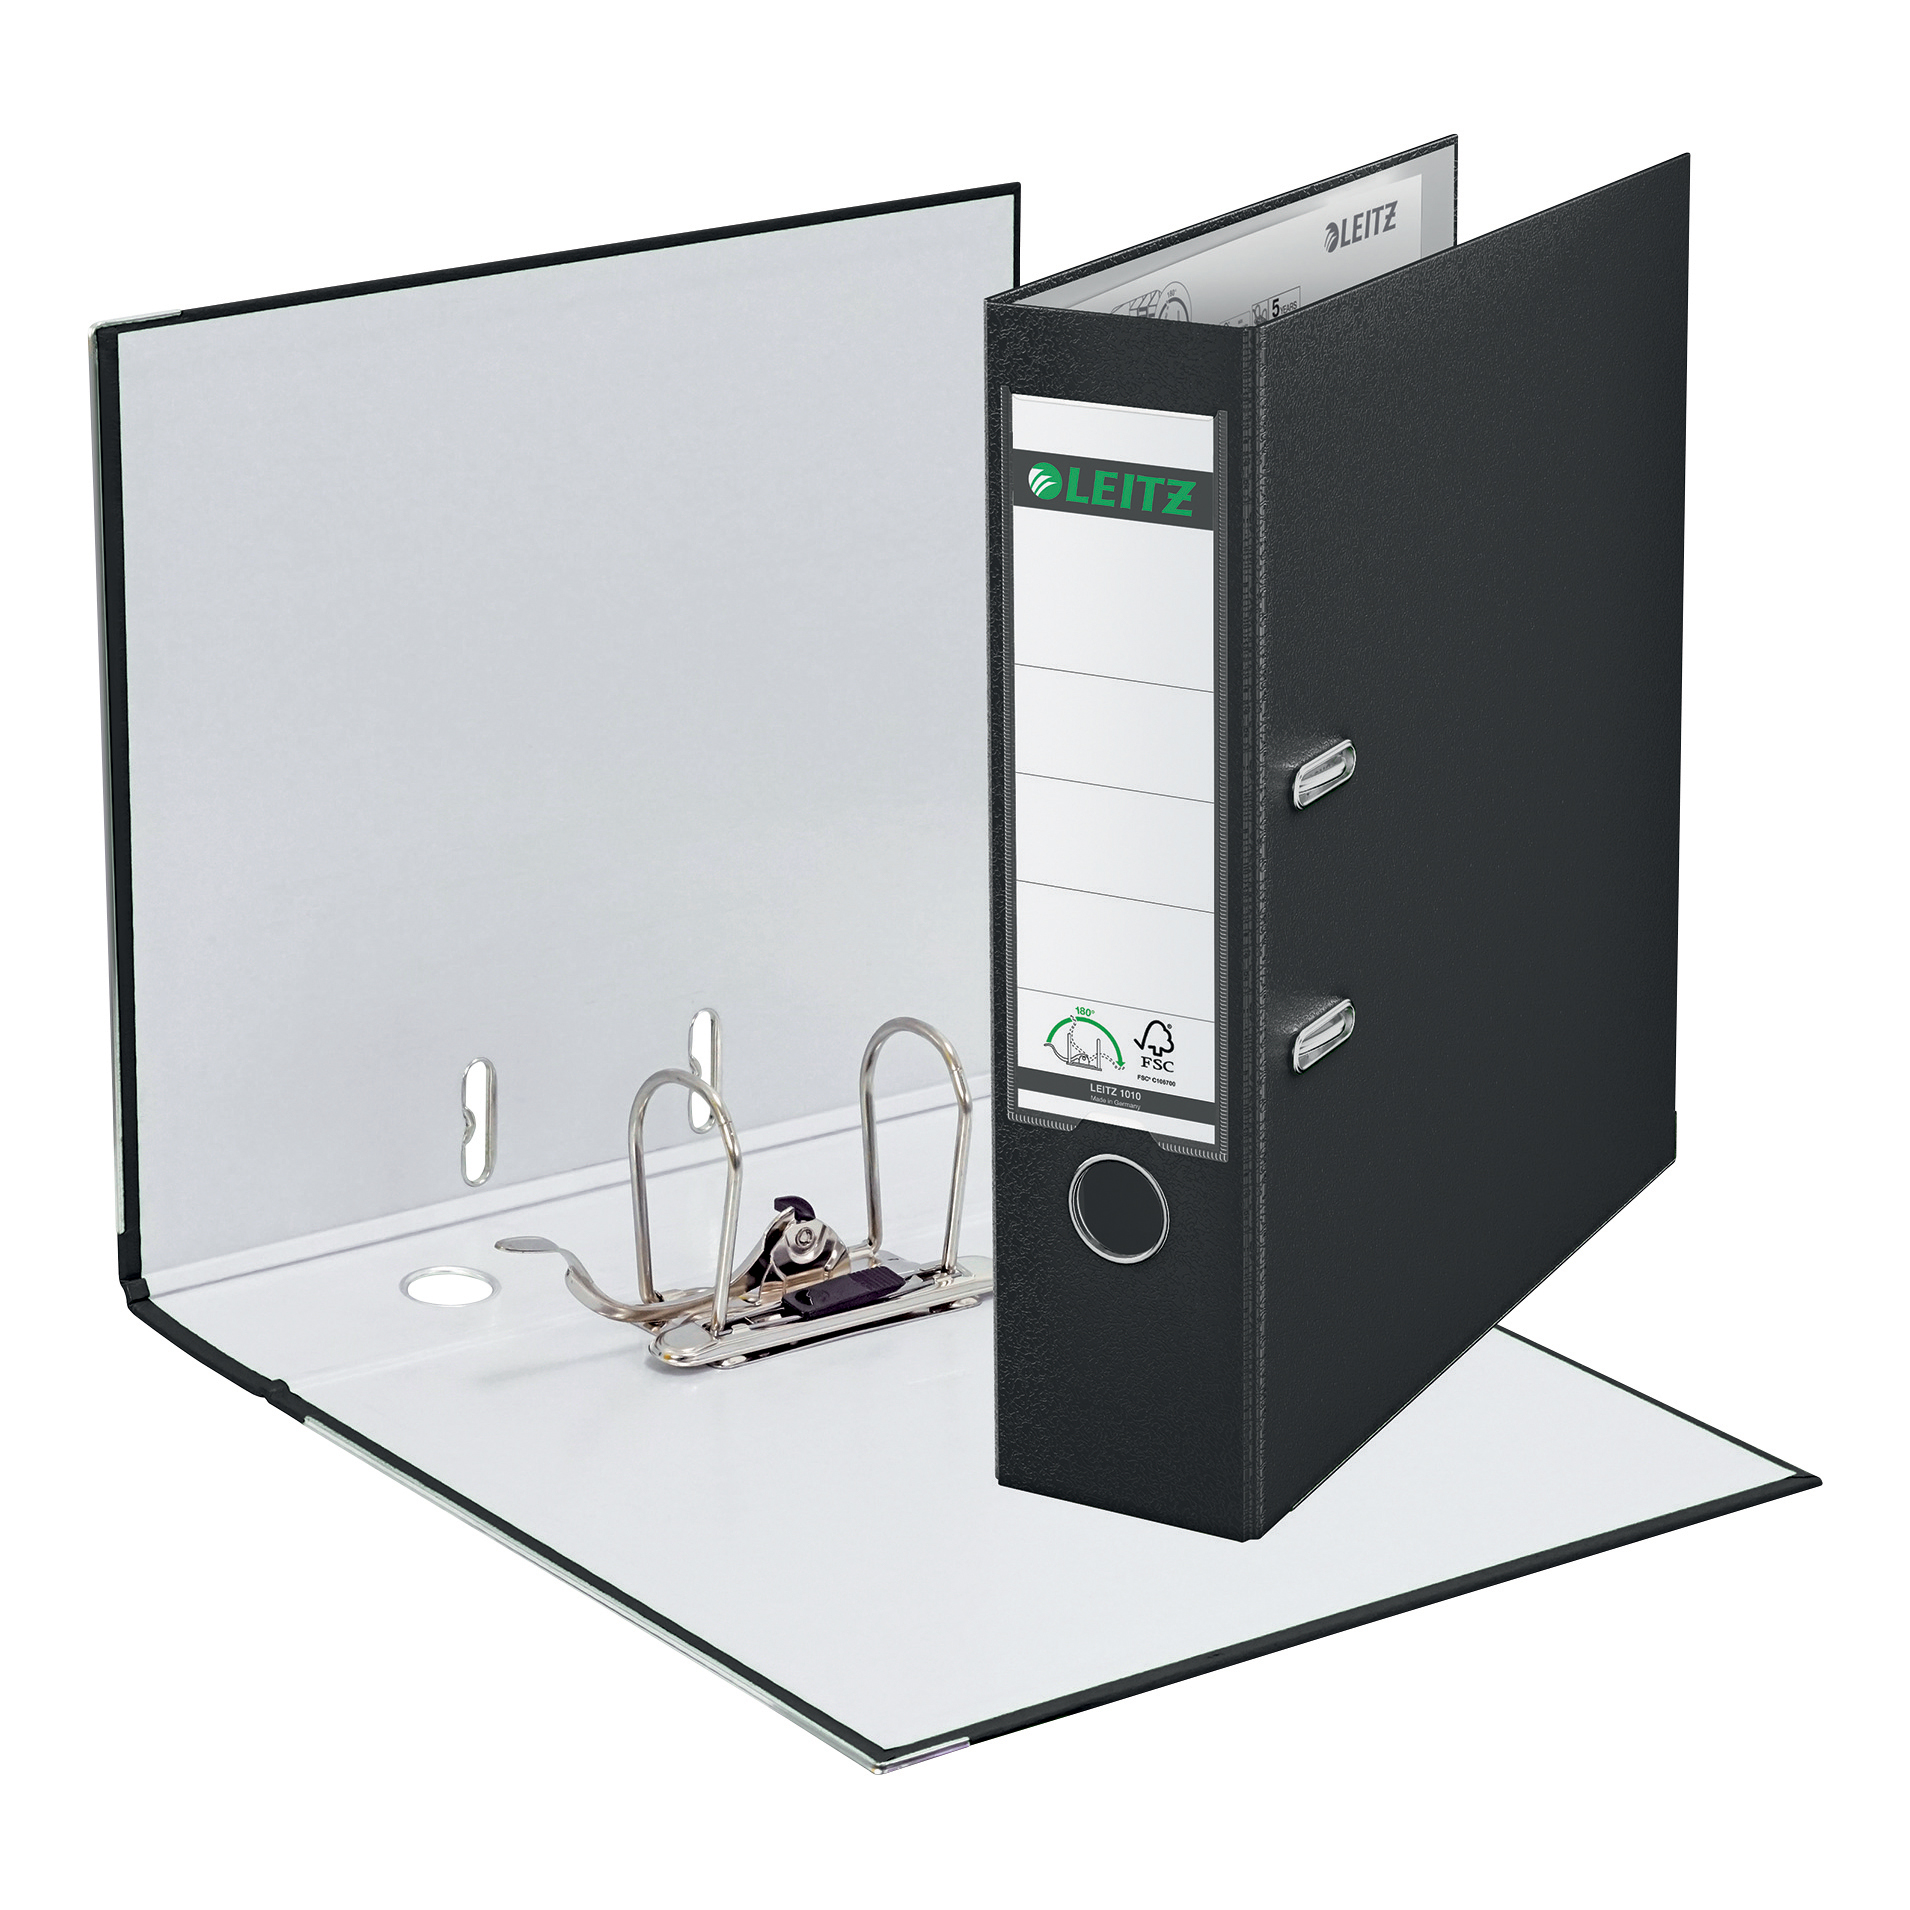 Leitz Lever Arch File Plastic 80mm Spine A4 Black Ref 10101095 [Pack 10]